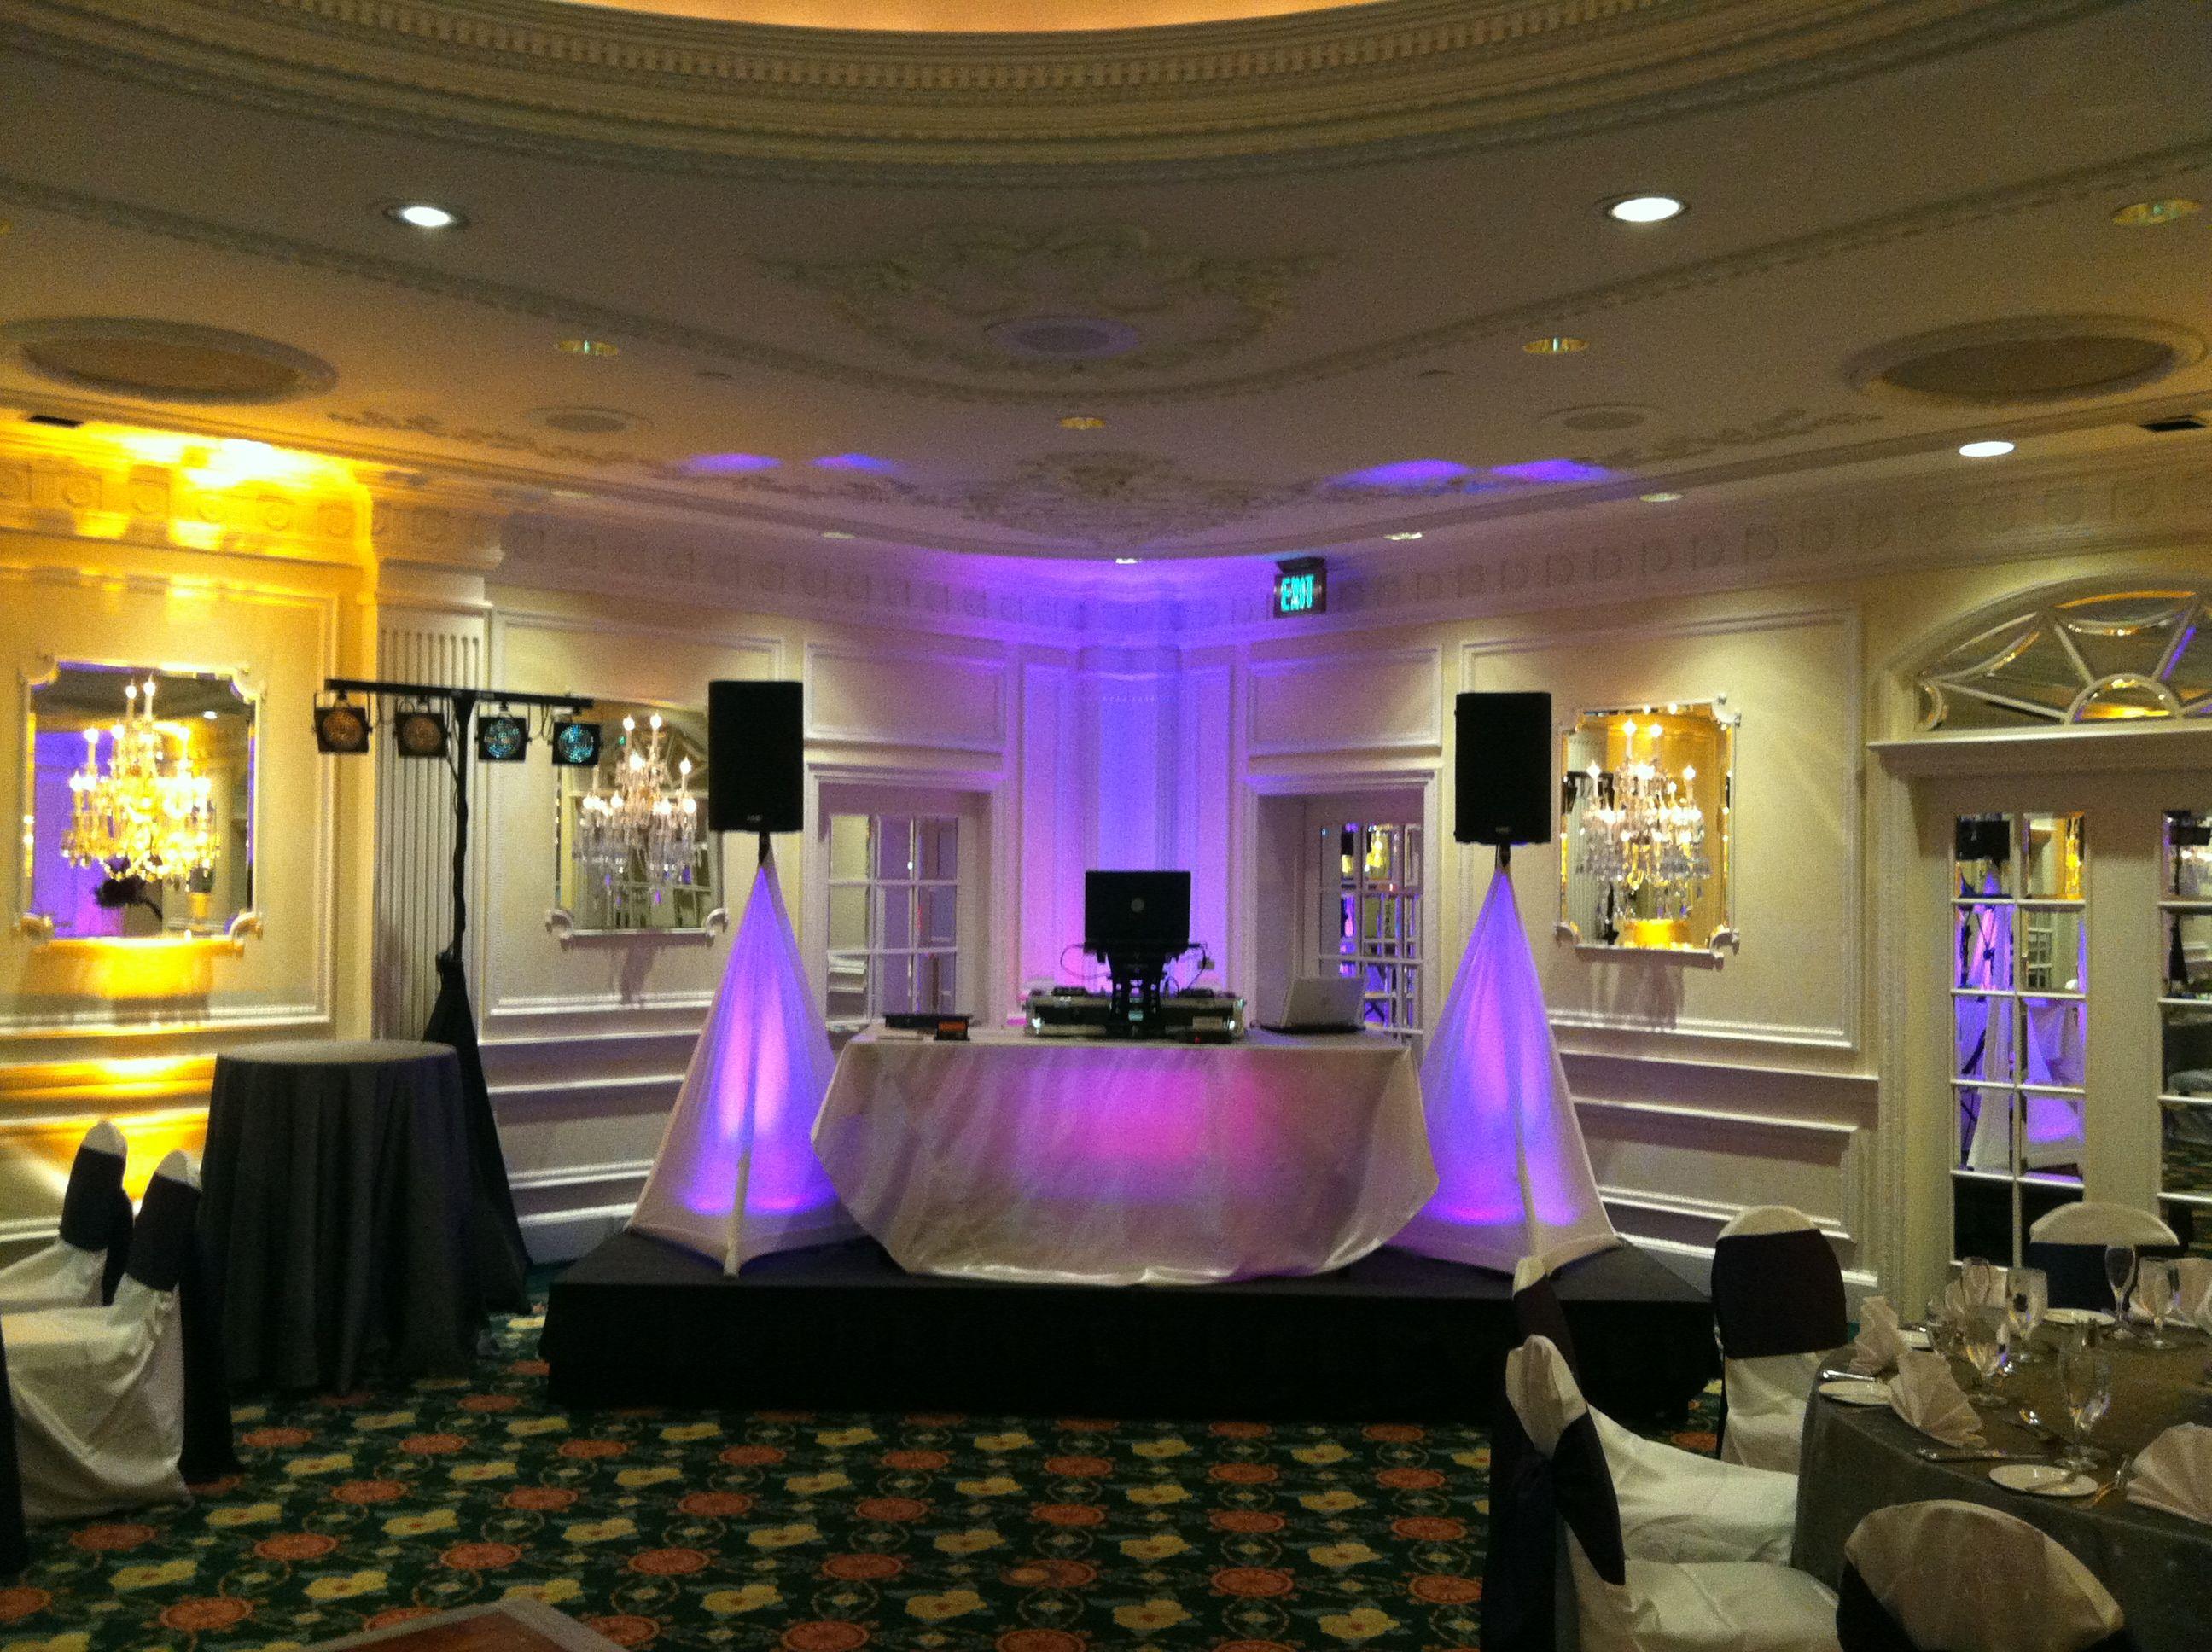 One Idea Of How Your Dj Could Be Setup Dj Setup Dj Dance Floor Lighting